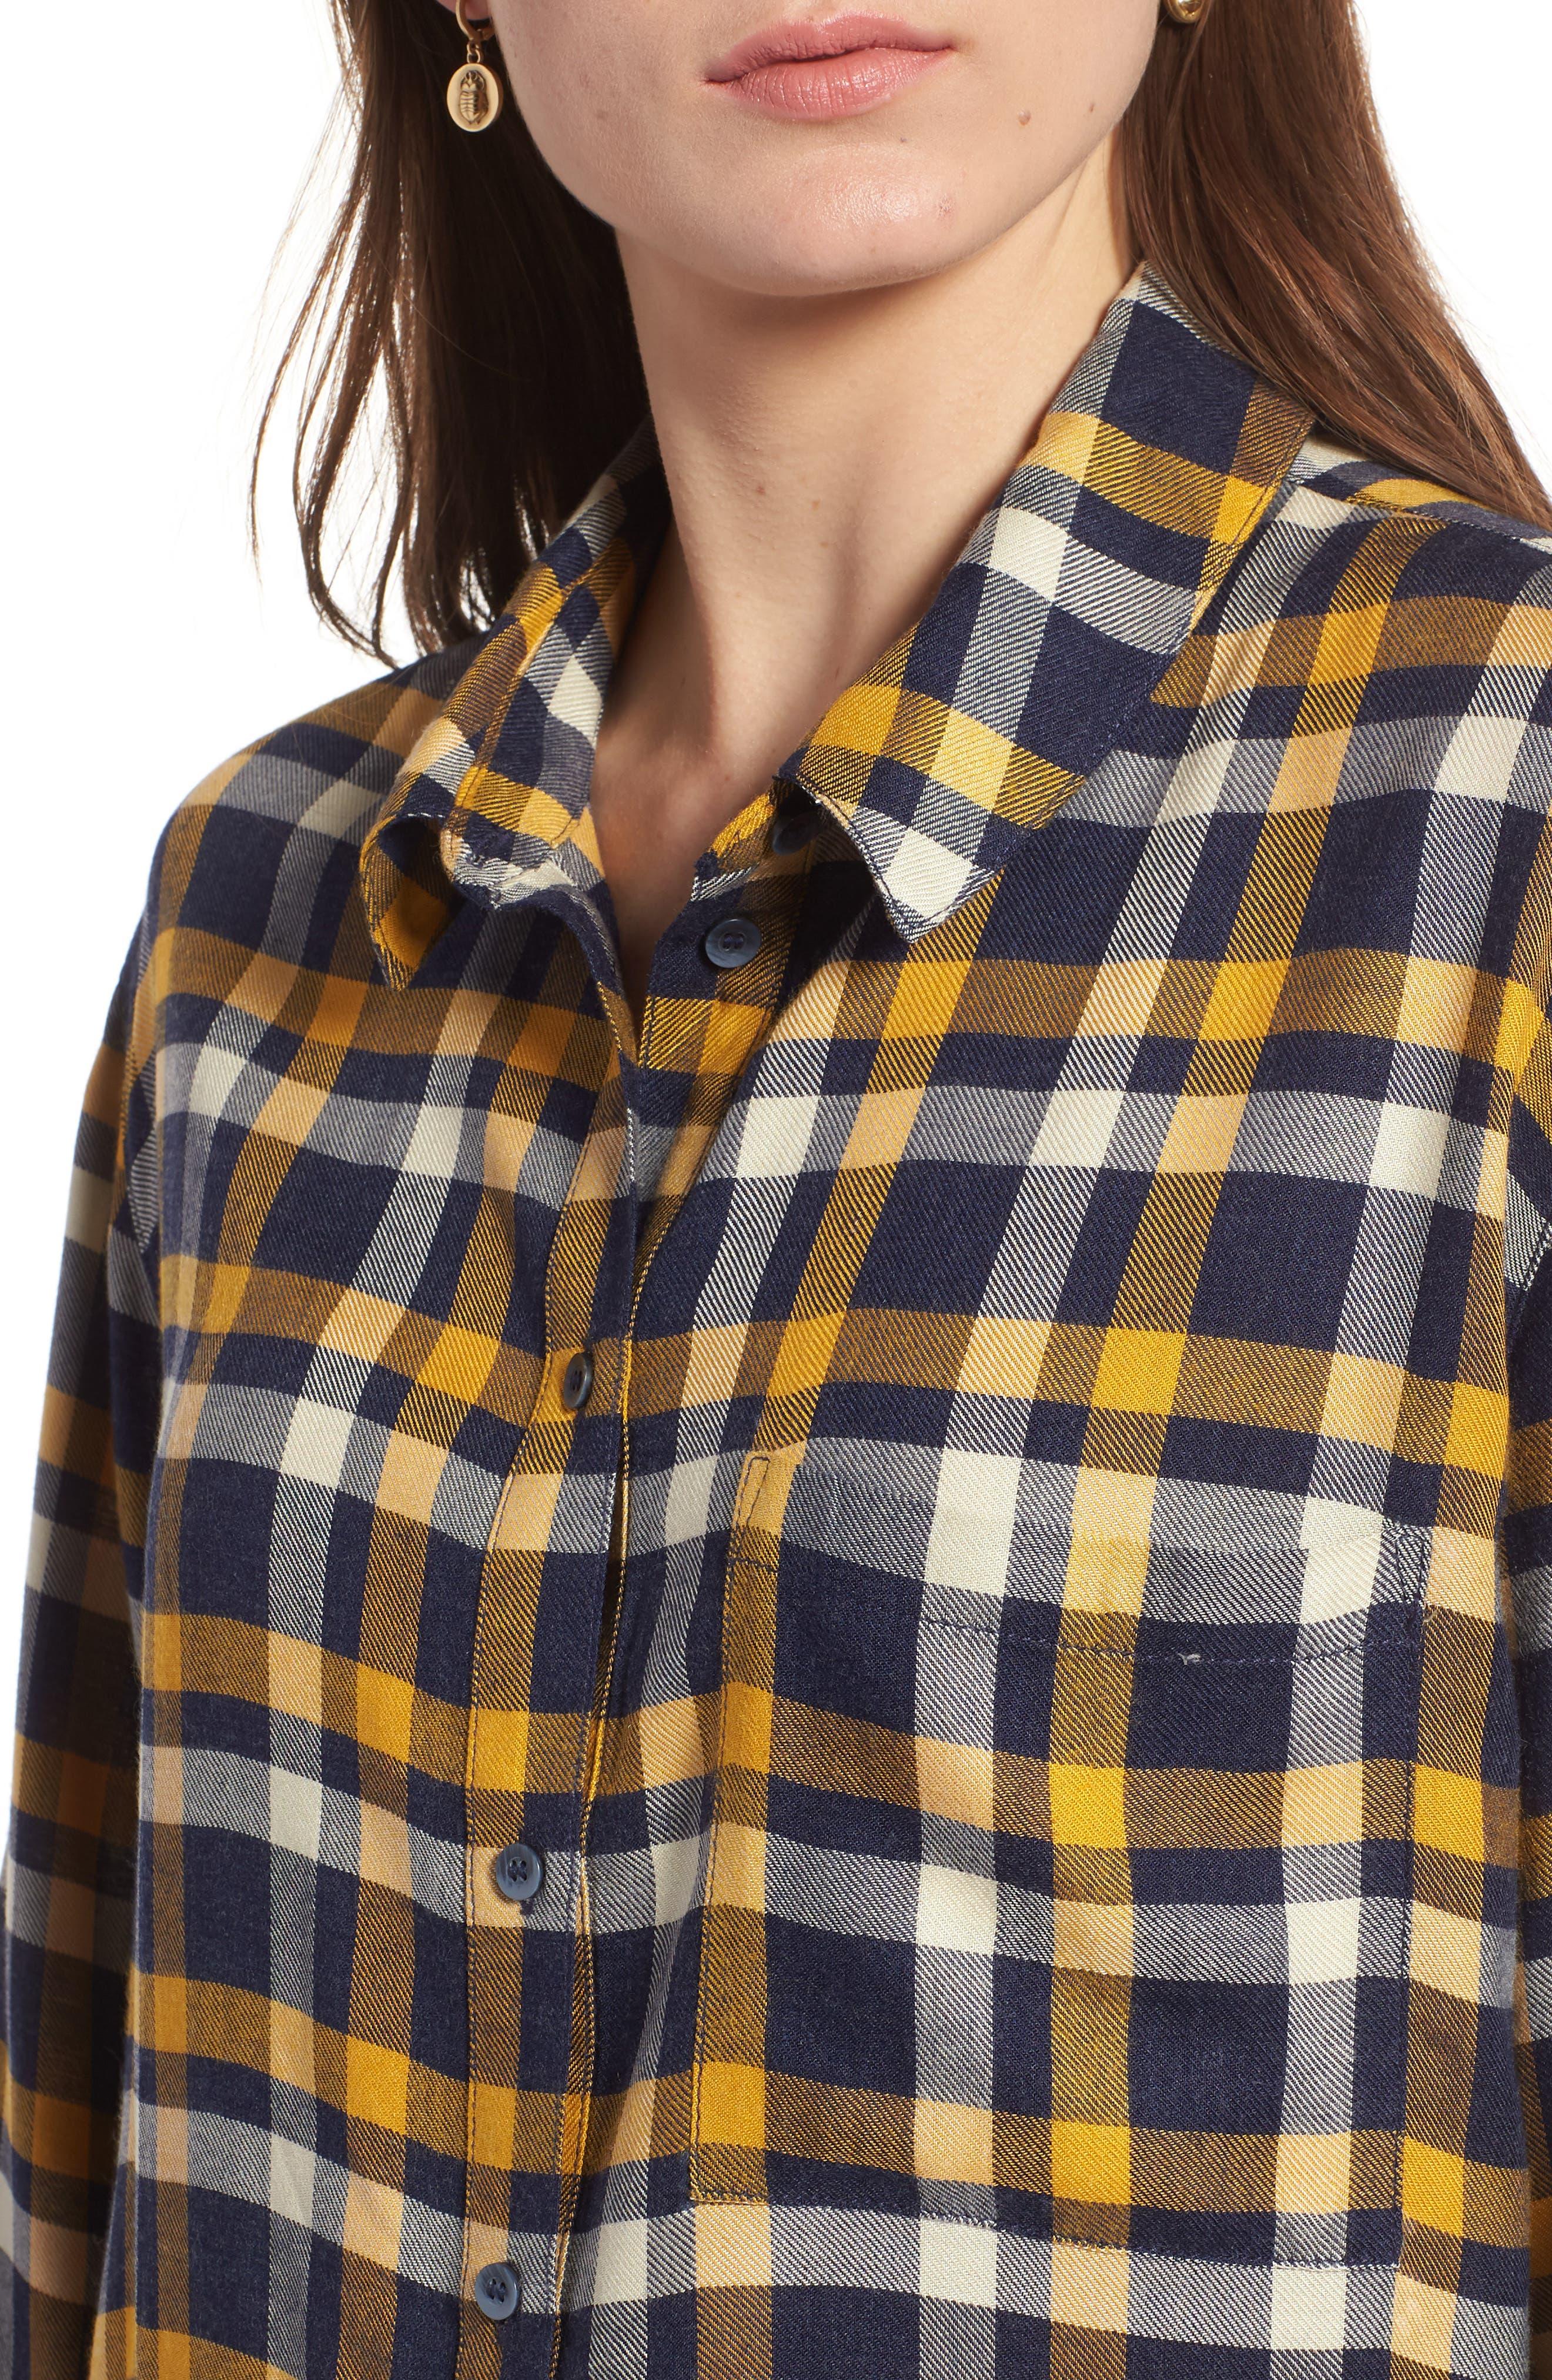 Plaid Boyfriend Shirt,                             Alternate thumbnail 4, color,                             Navy Maritime Offset Wndw Pane